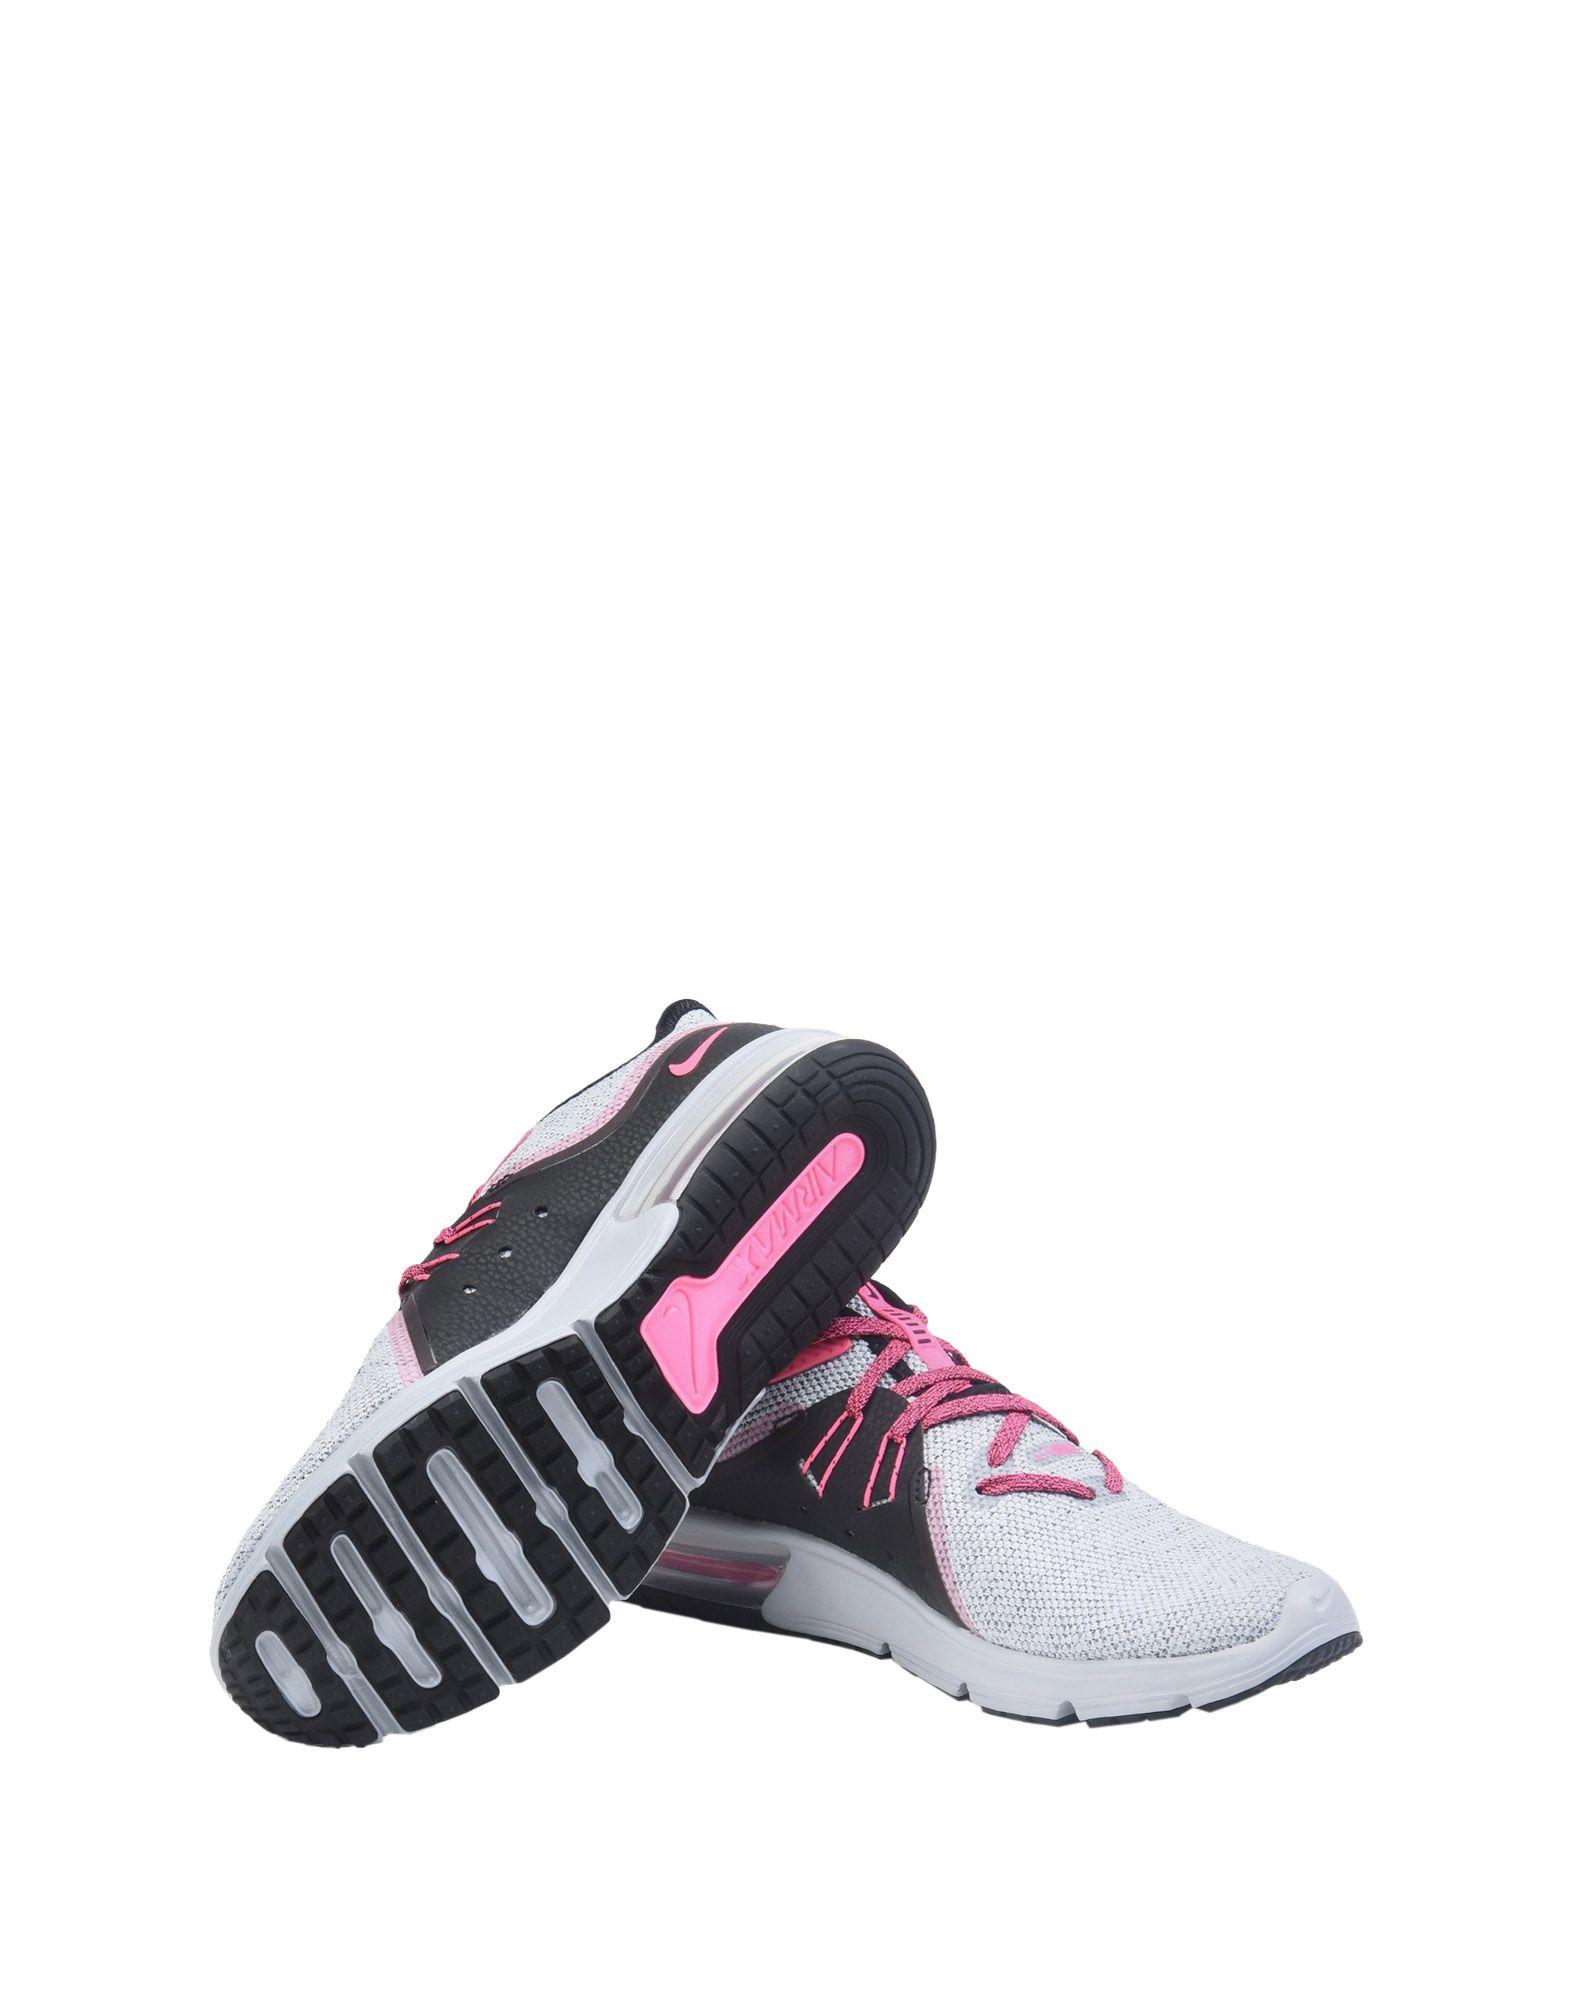 Nike  Air Max Sequent 3  Schuhe 11511852DT Gute Qualität beliebte Schuhe  b33f44